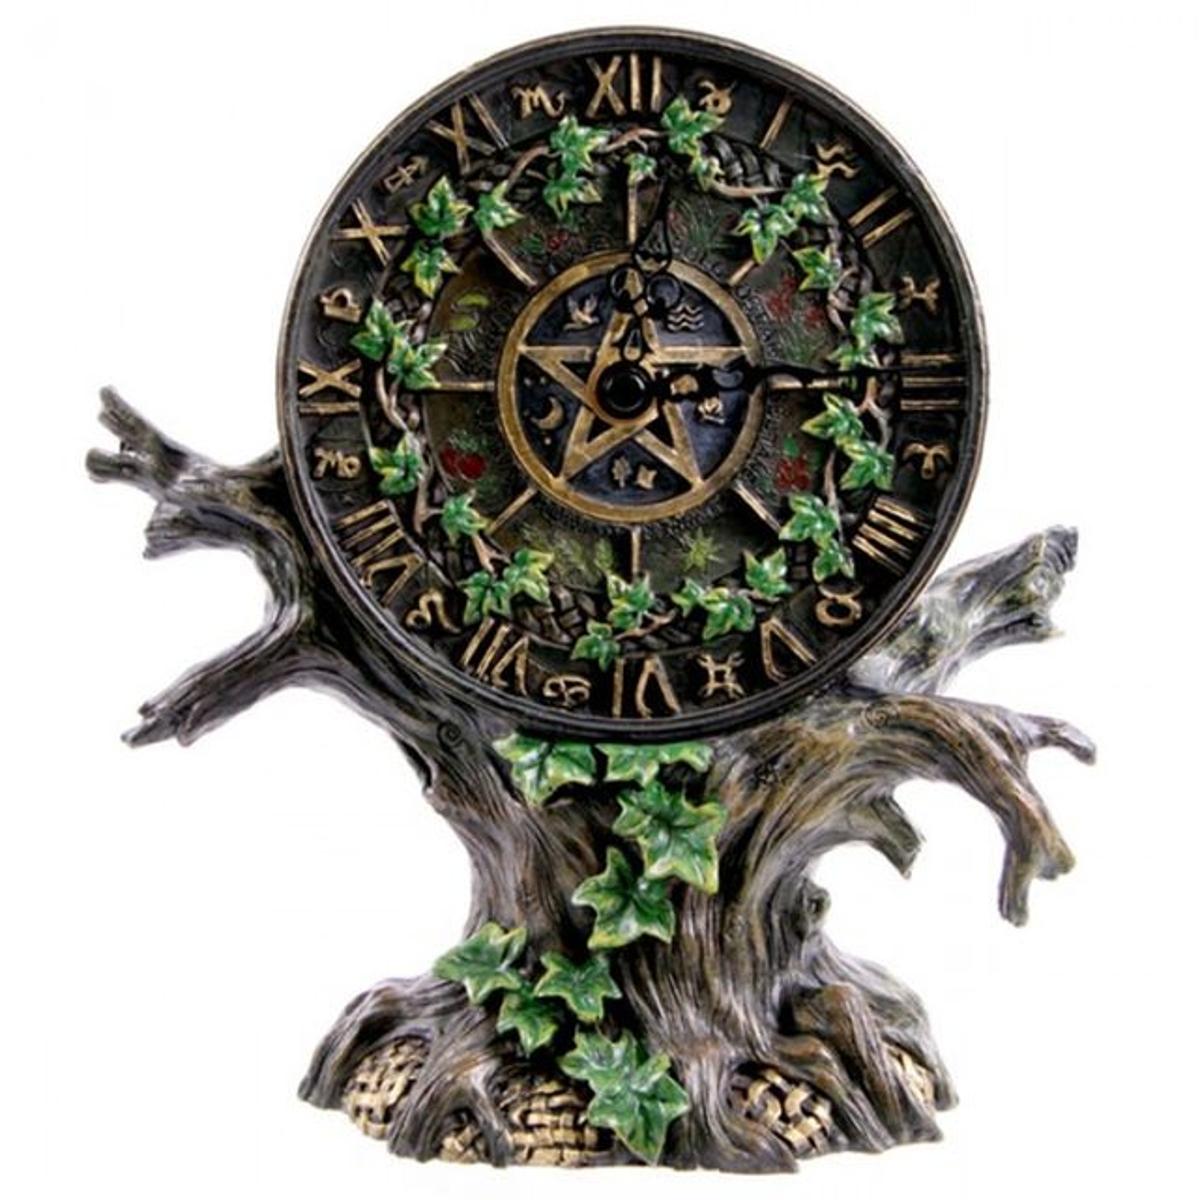 Horloge ou Pendule Arbre astrologie 22 cm